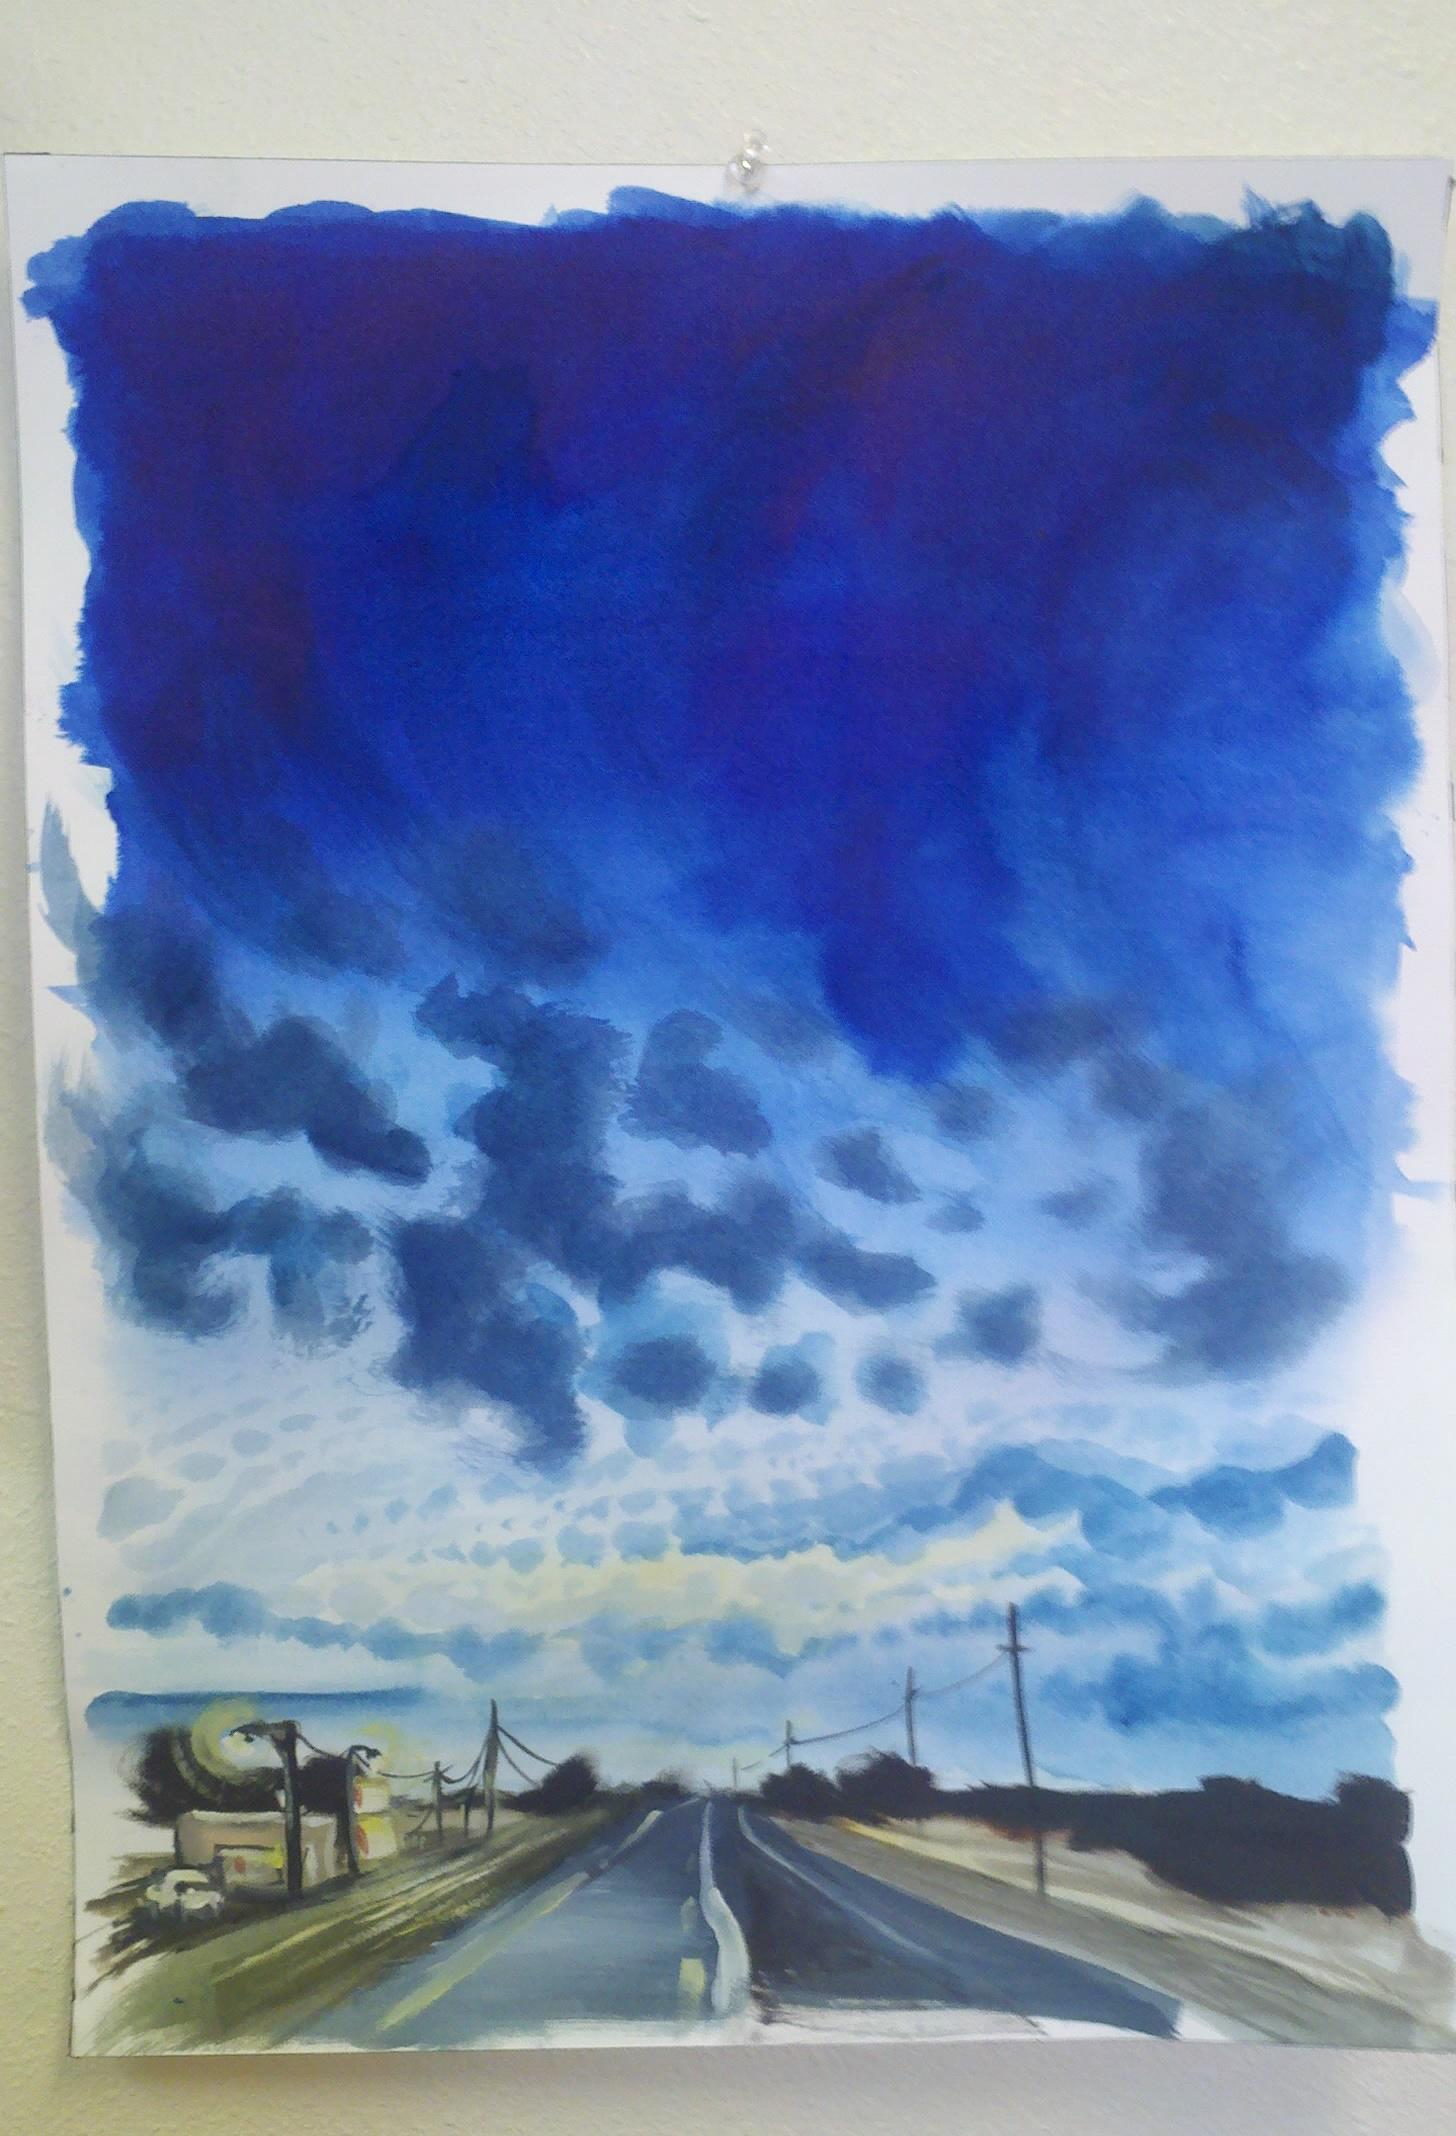 sunrise on iowa highway, landscape painting